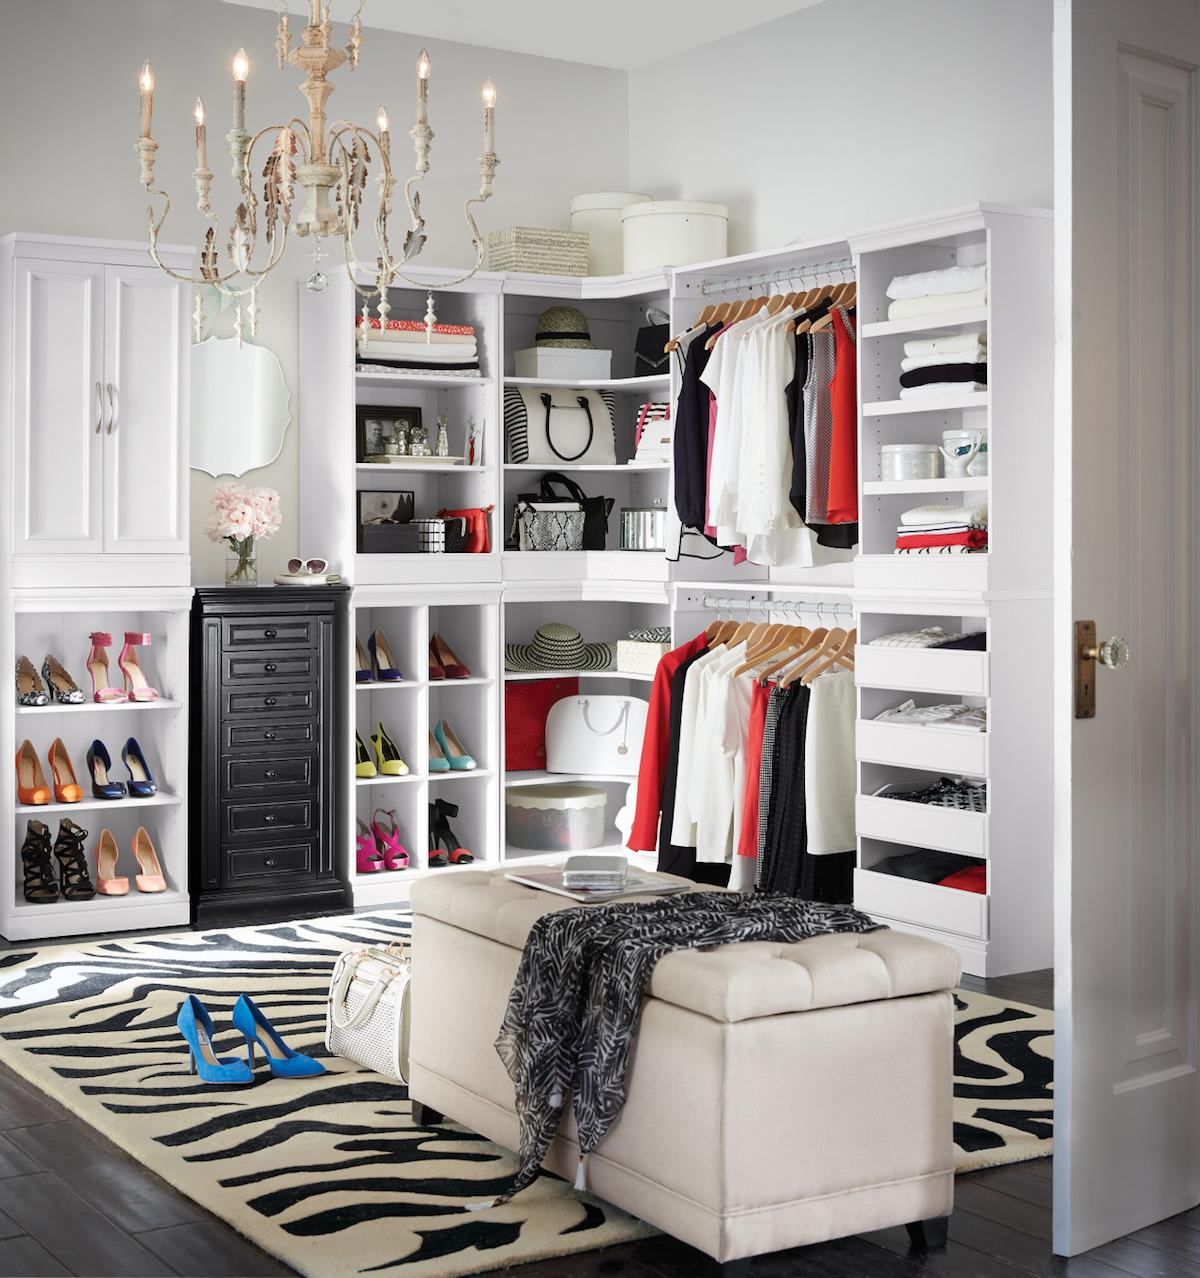 Super Ideias Para O Closet Home Office Dos Meus Sonhos Largest Home Design Picture Inspirations Pitcheantrous